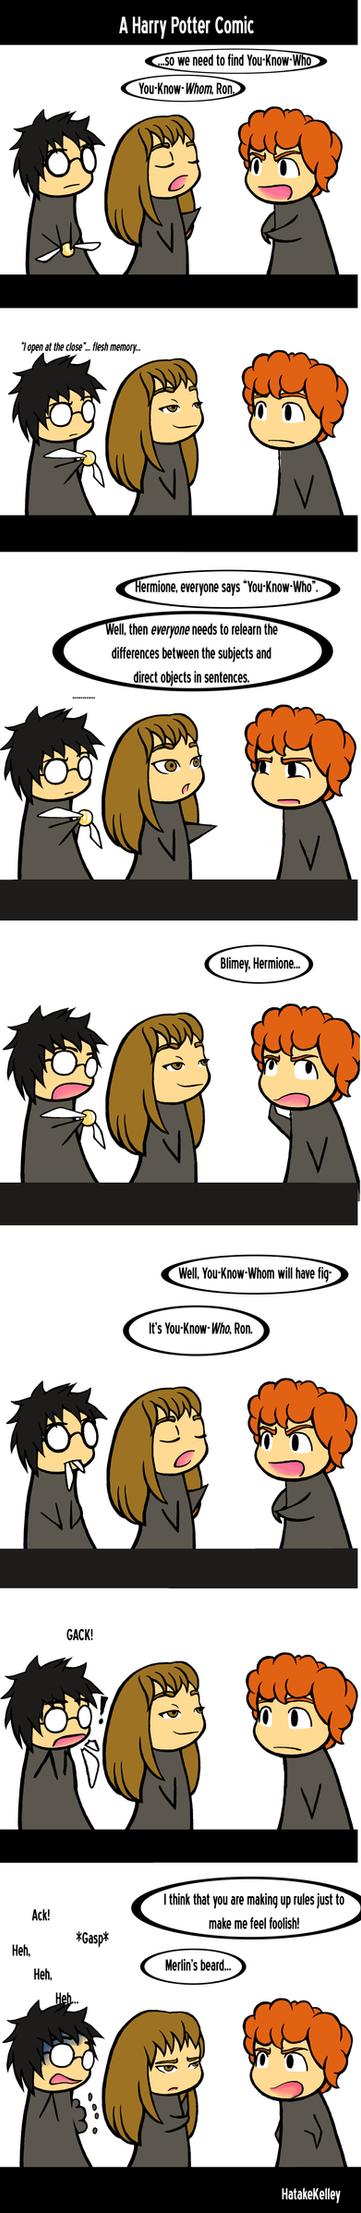 Harry Potter Comic by KelleyArline